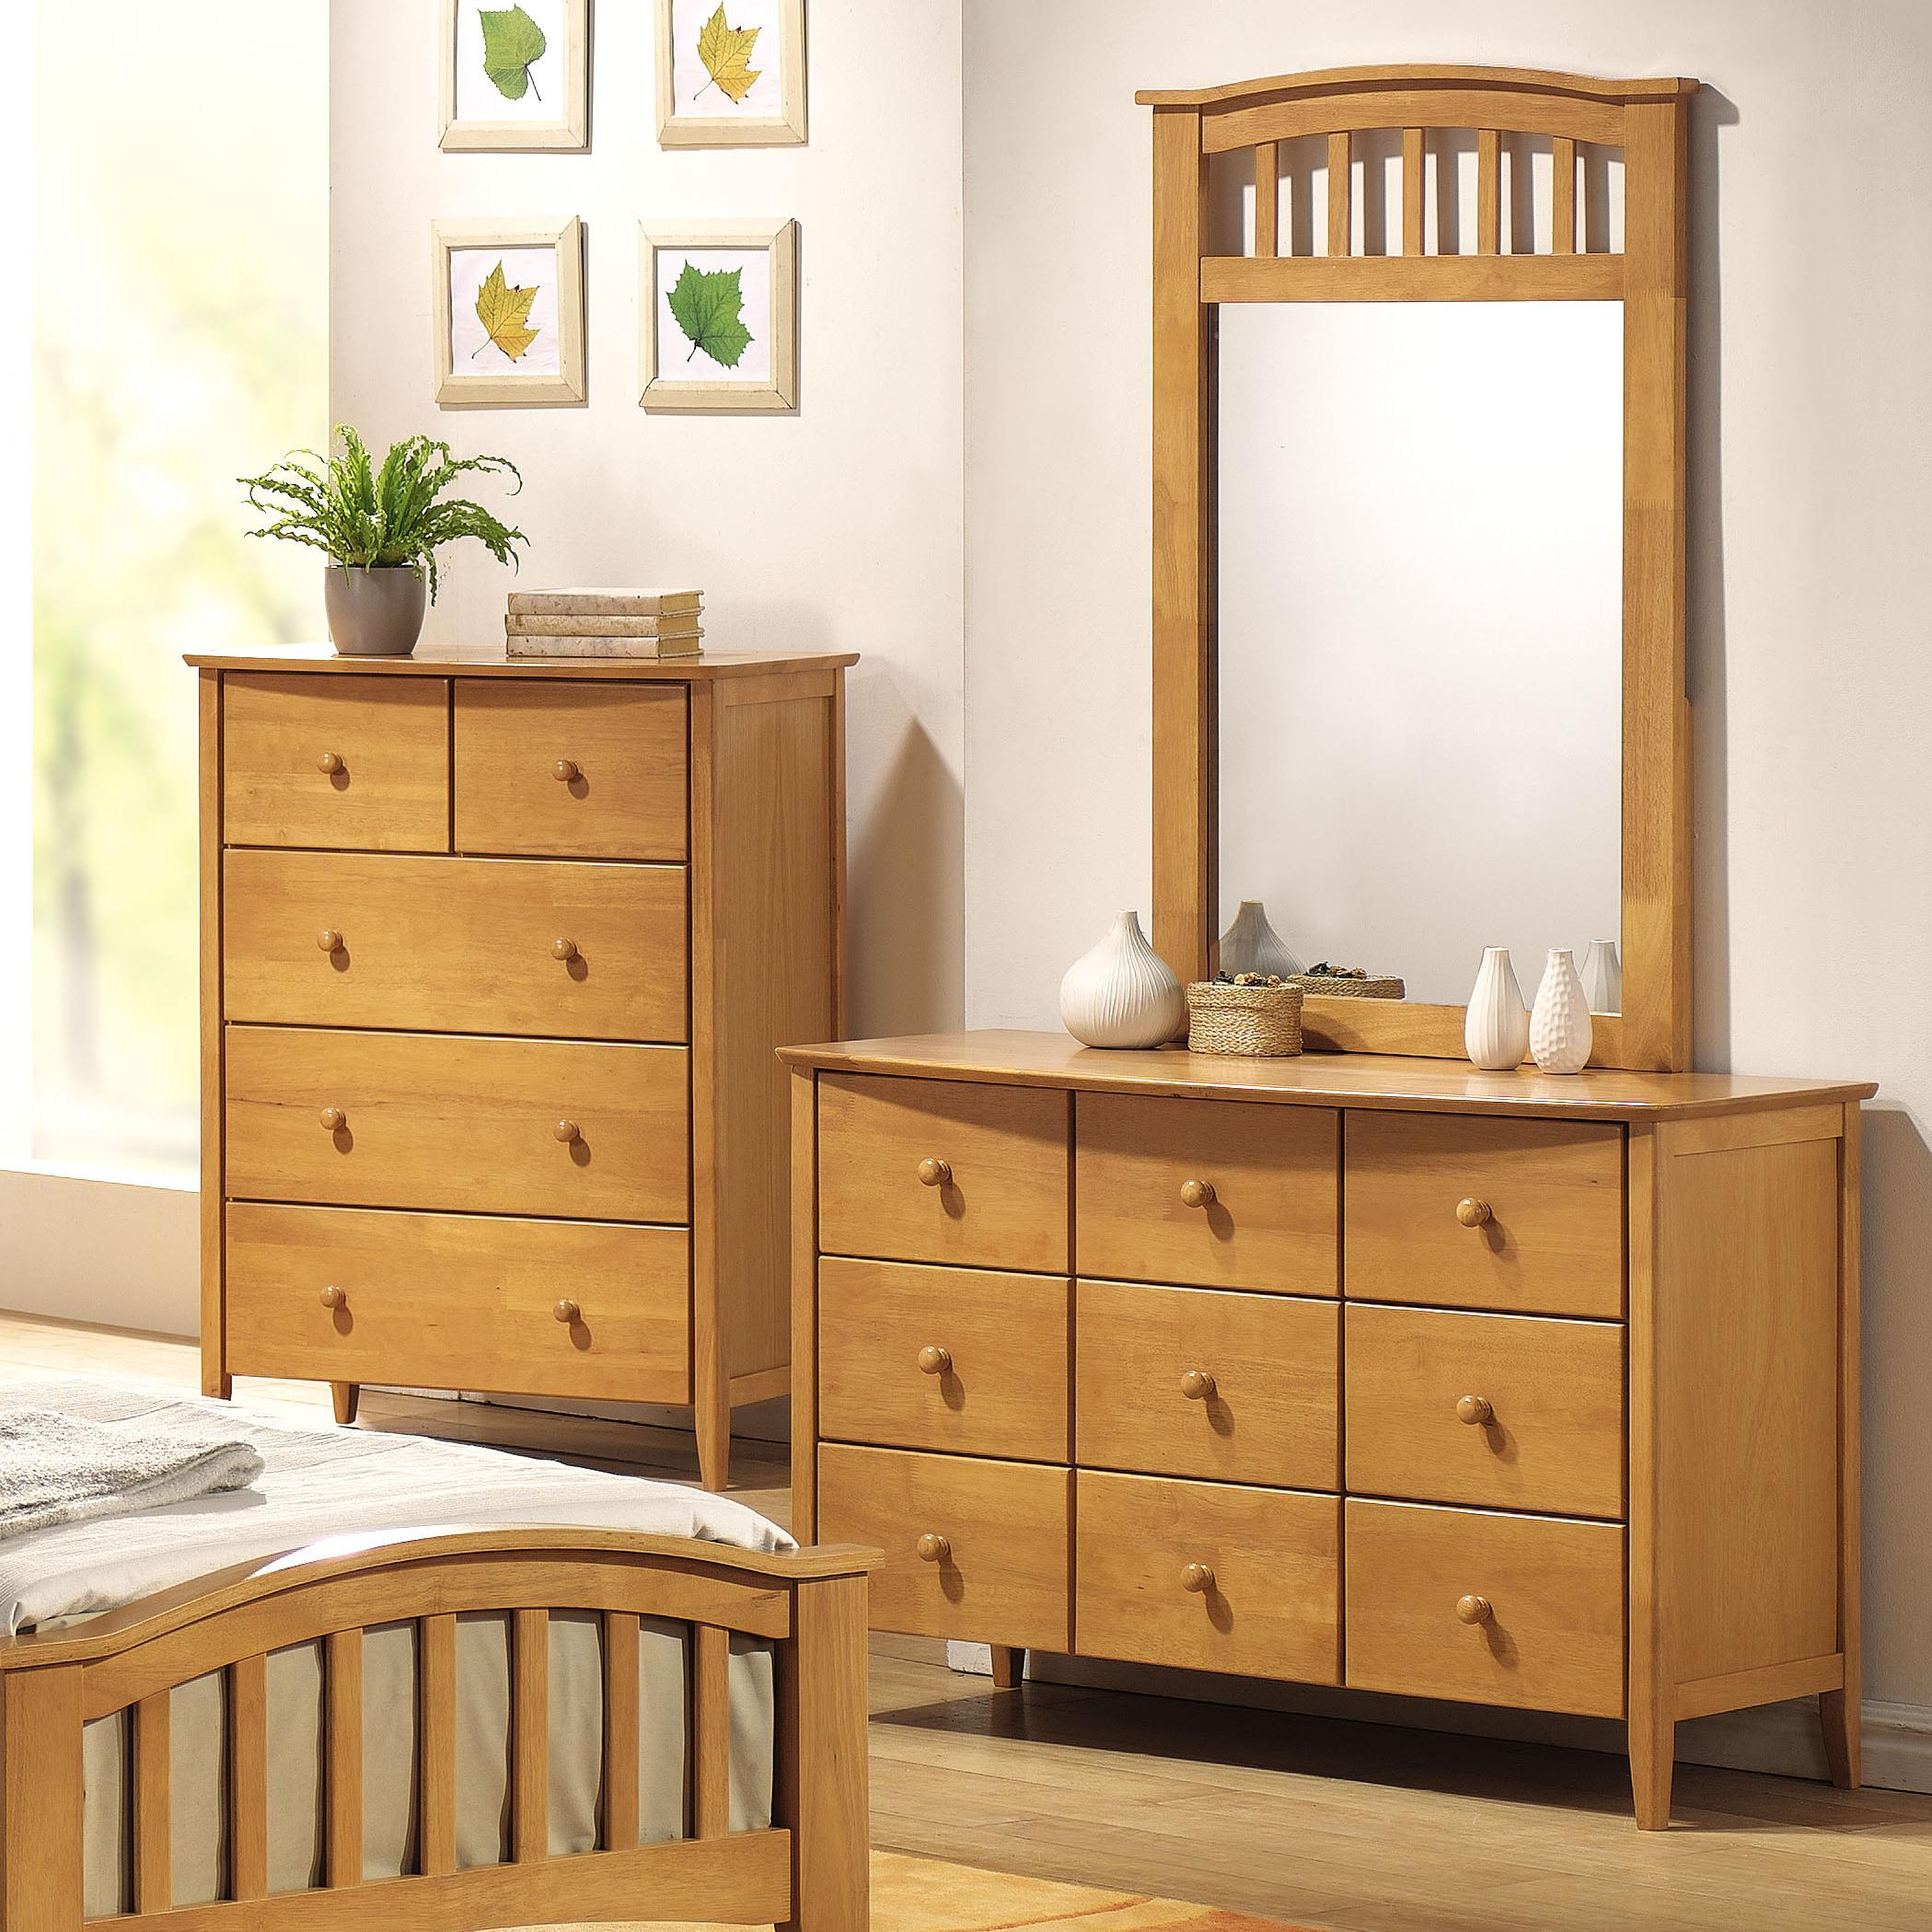 San Marino Dresser & Mirror Combo by Acme Furniture at A1 Furniture & Mattress